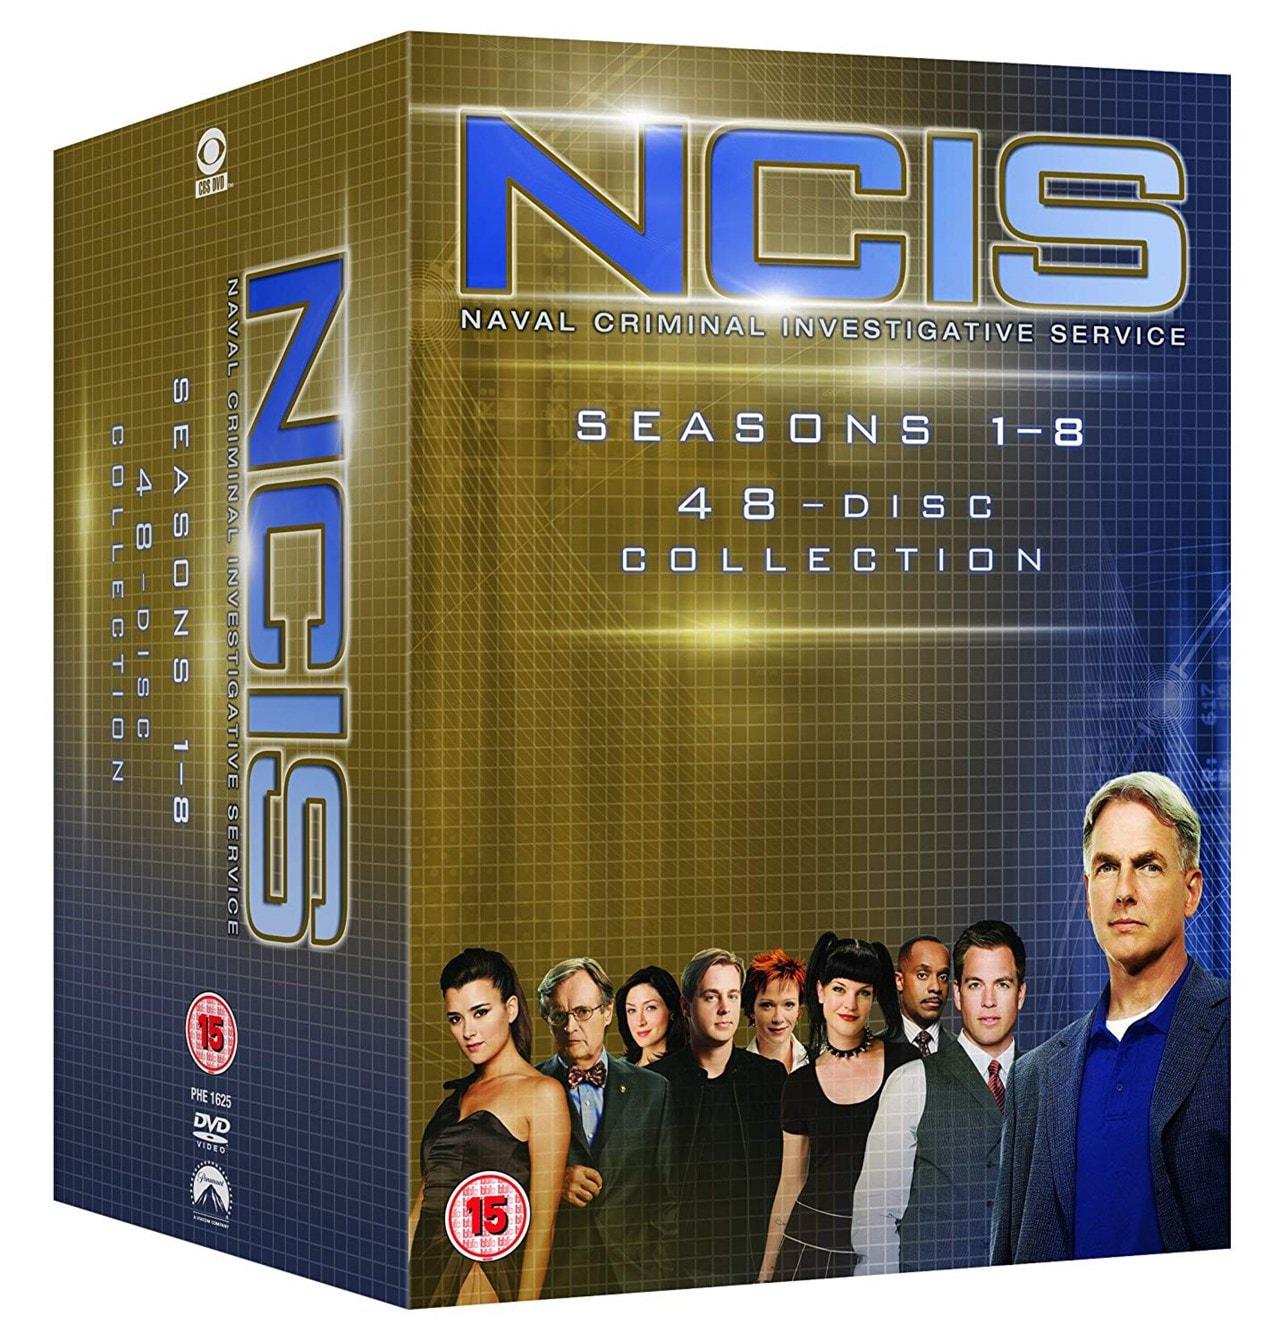 NCIS: Seasons 1-8 - 2